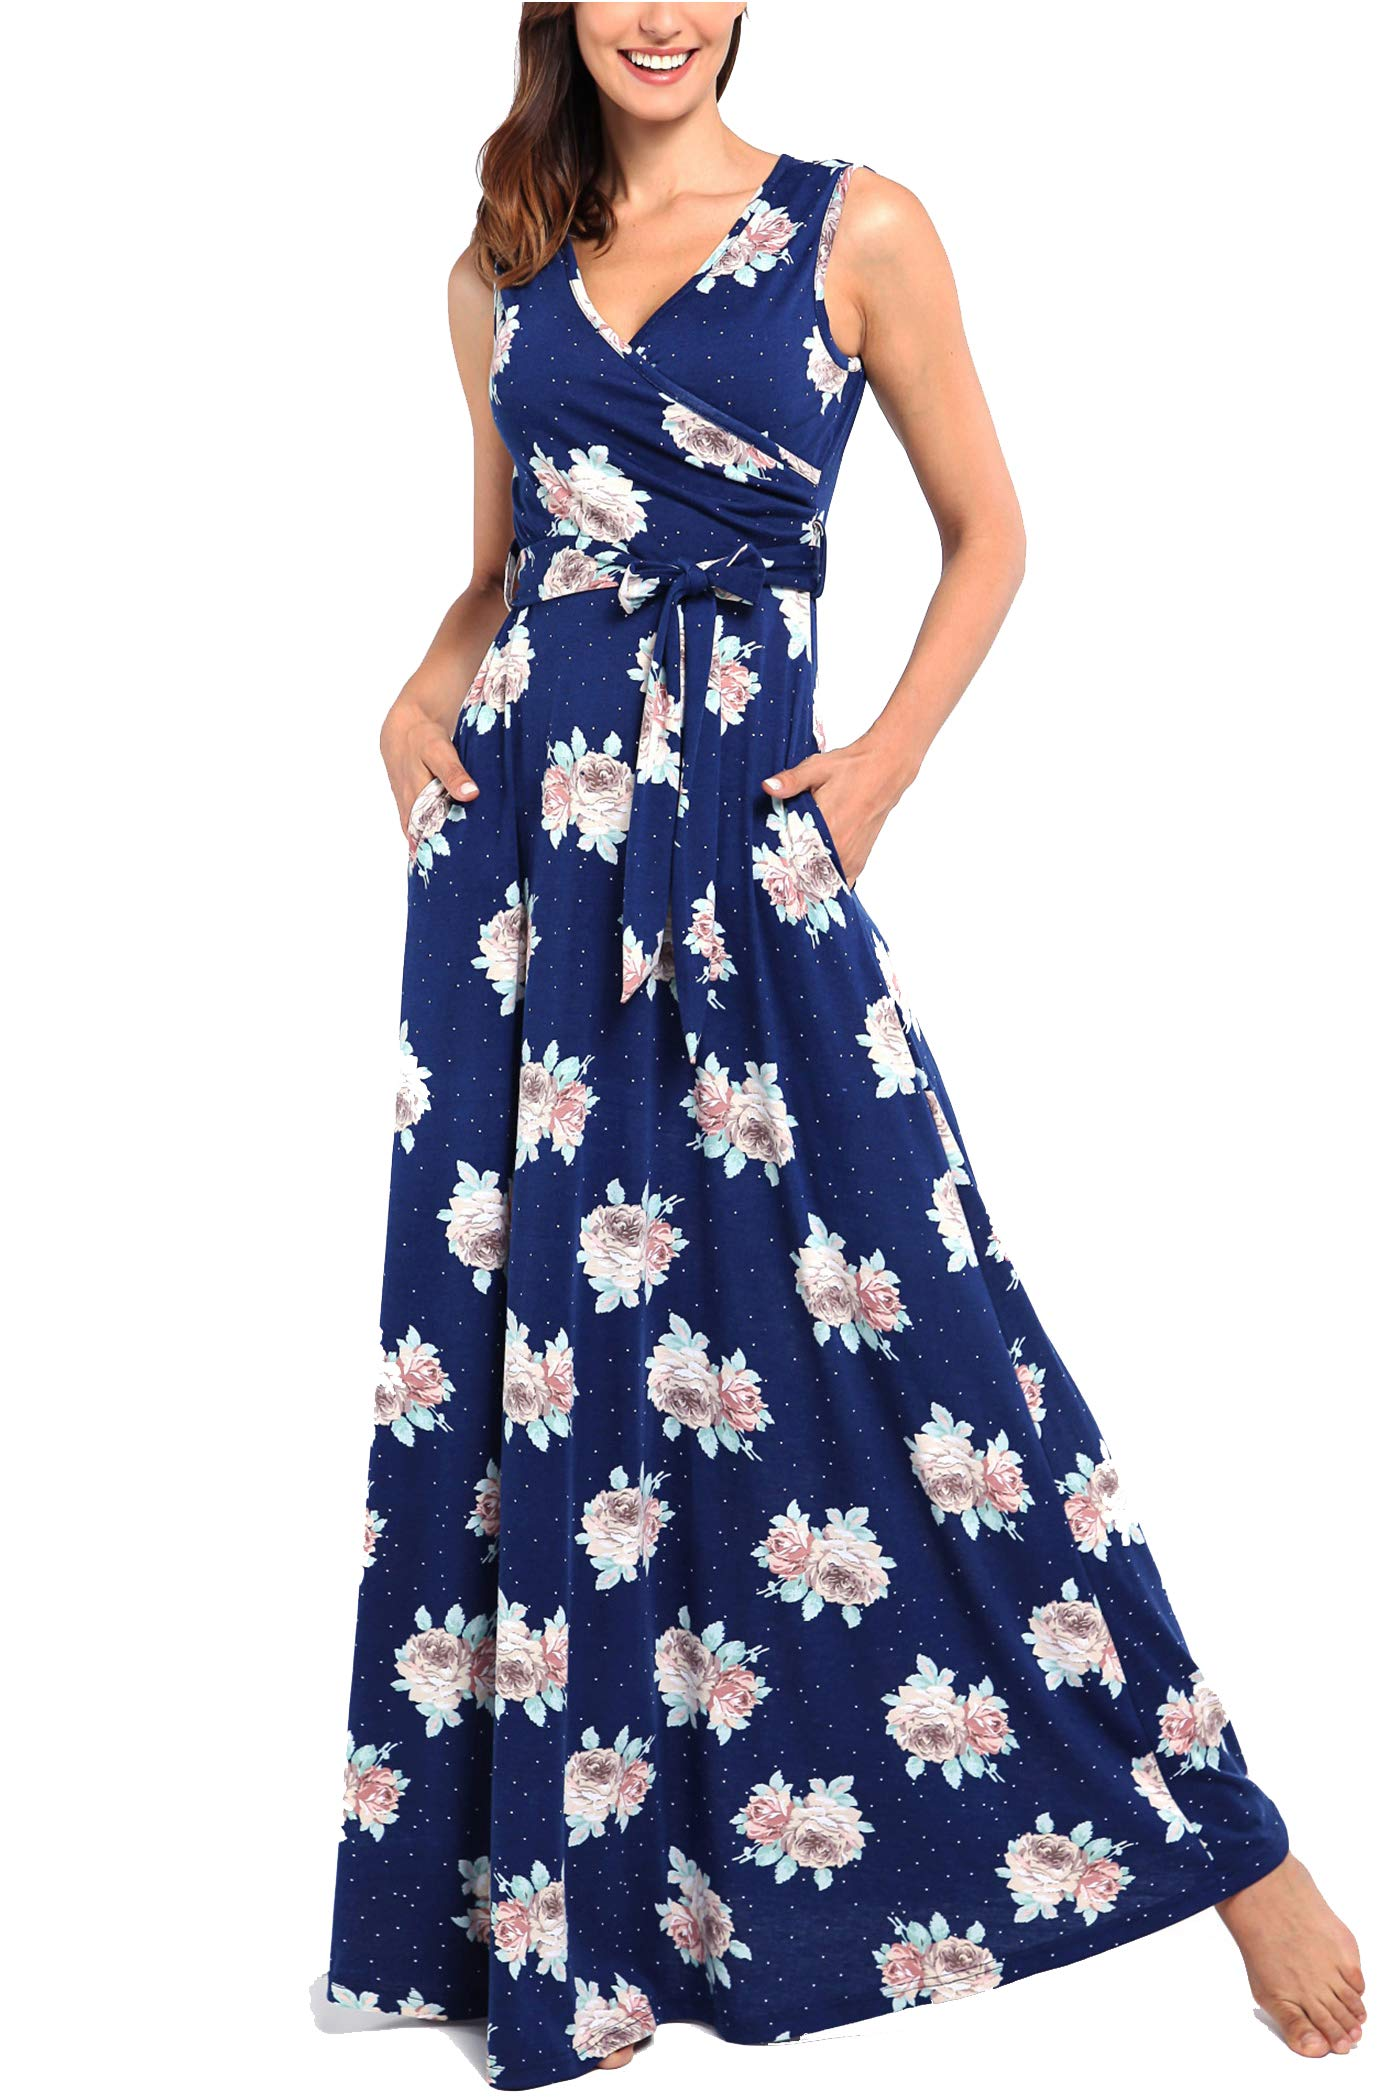 6b8b9326e5 Galleon - Comila Plus Size Floral Maxi Dresses For Women